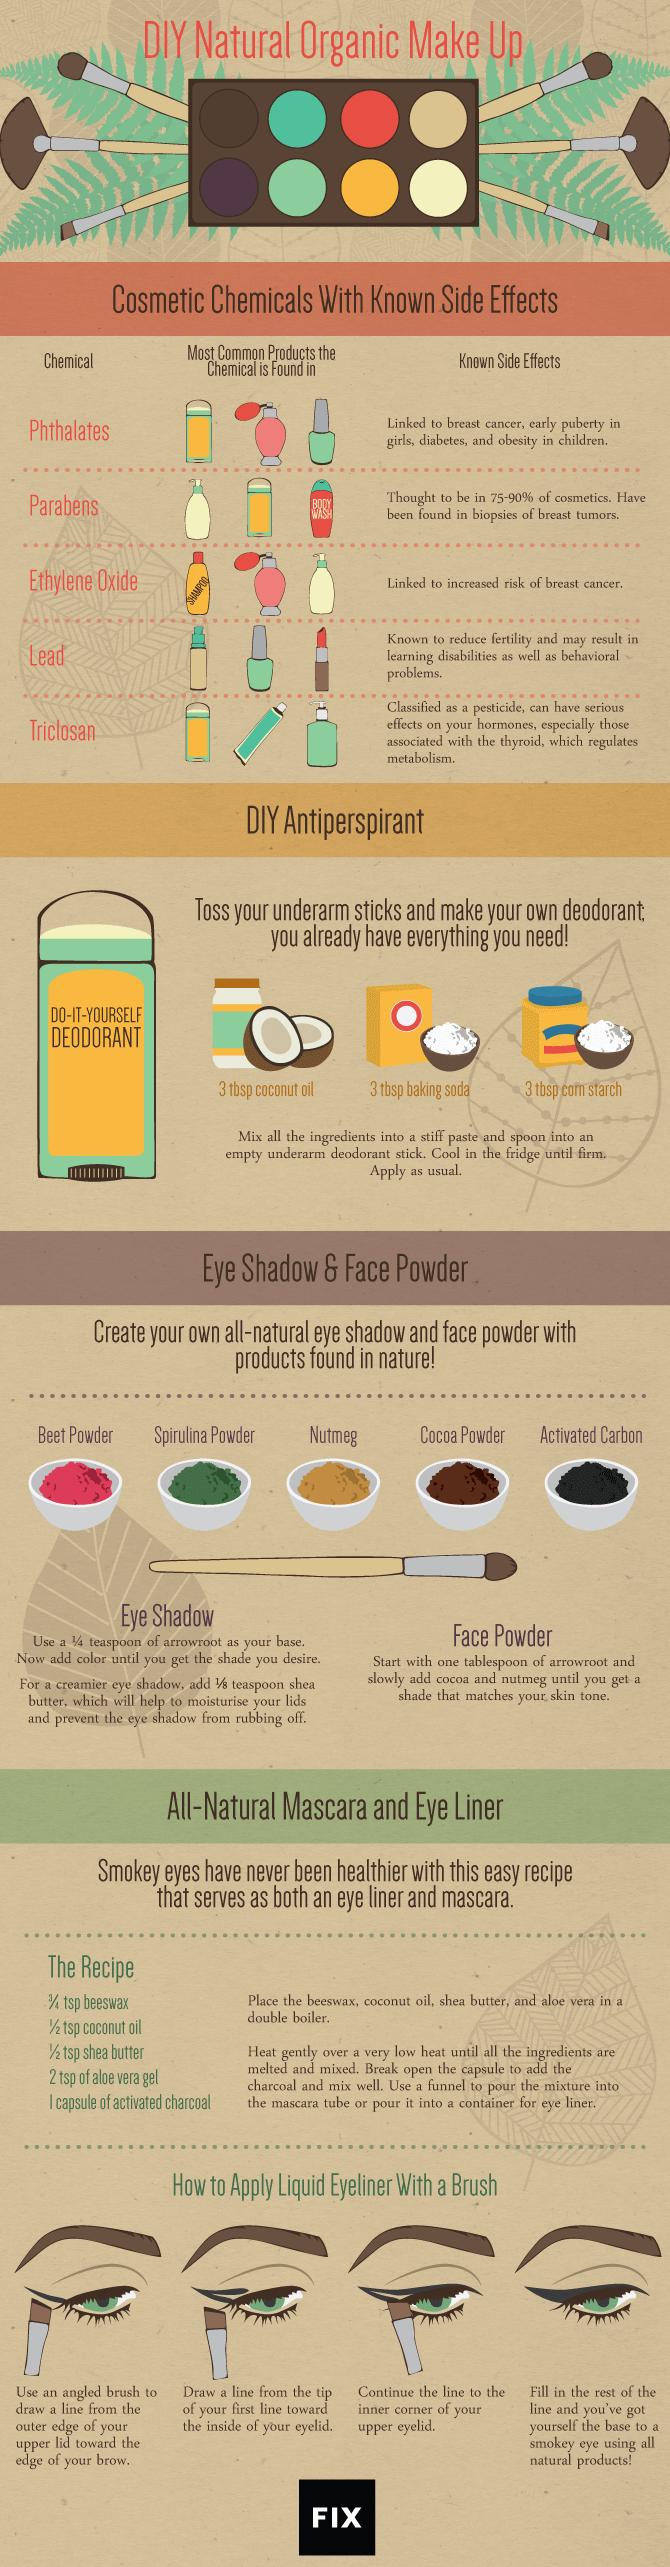 DIY natural organic Make up